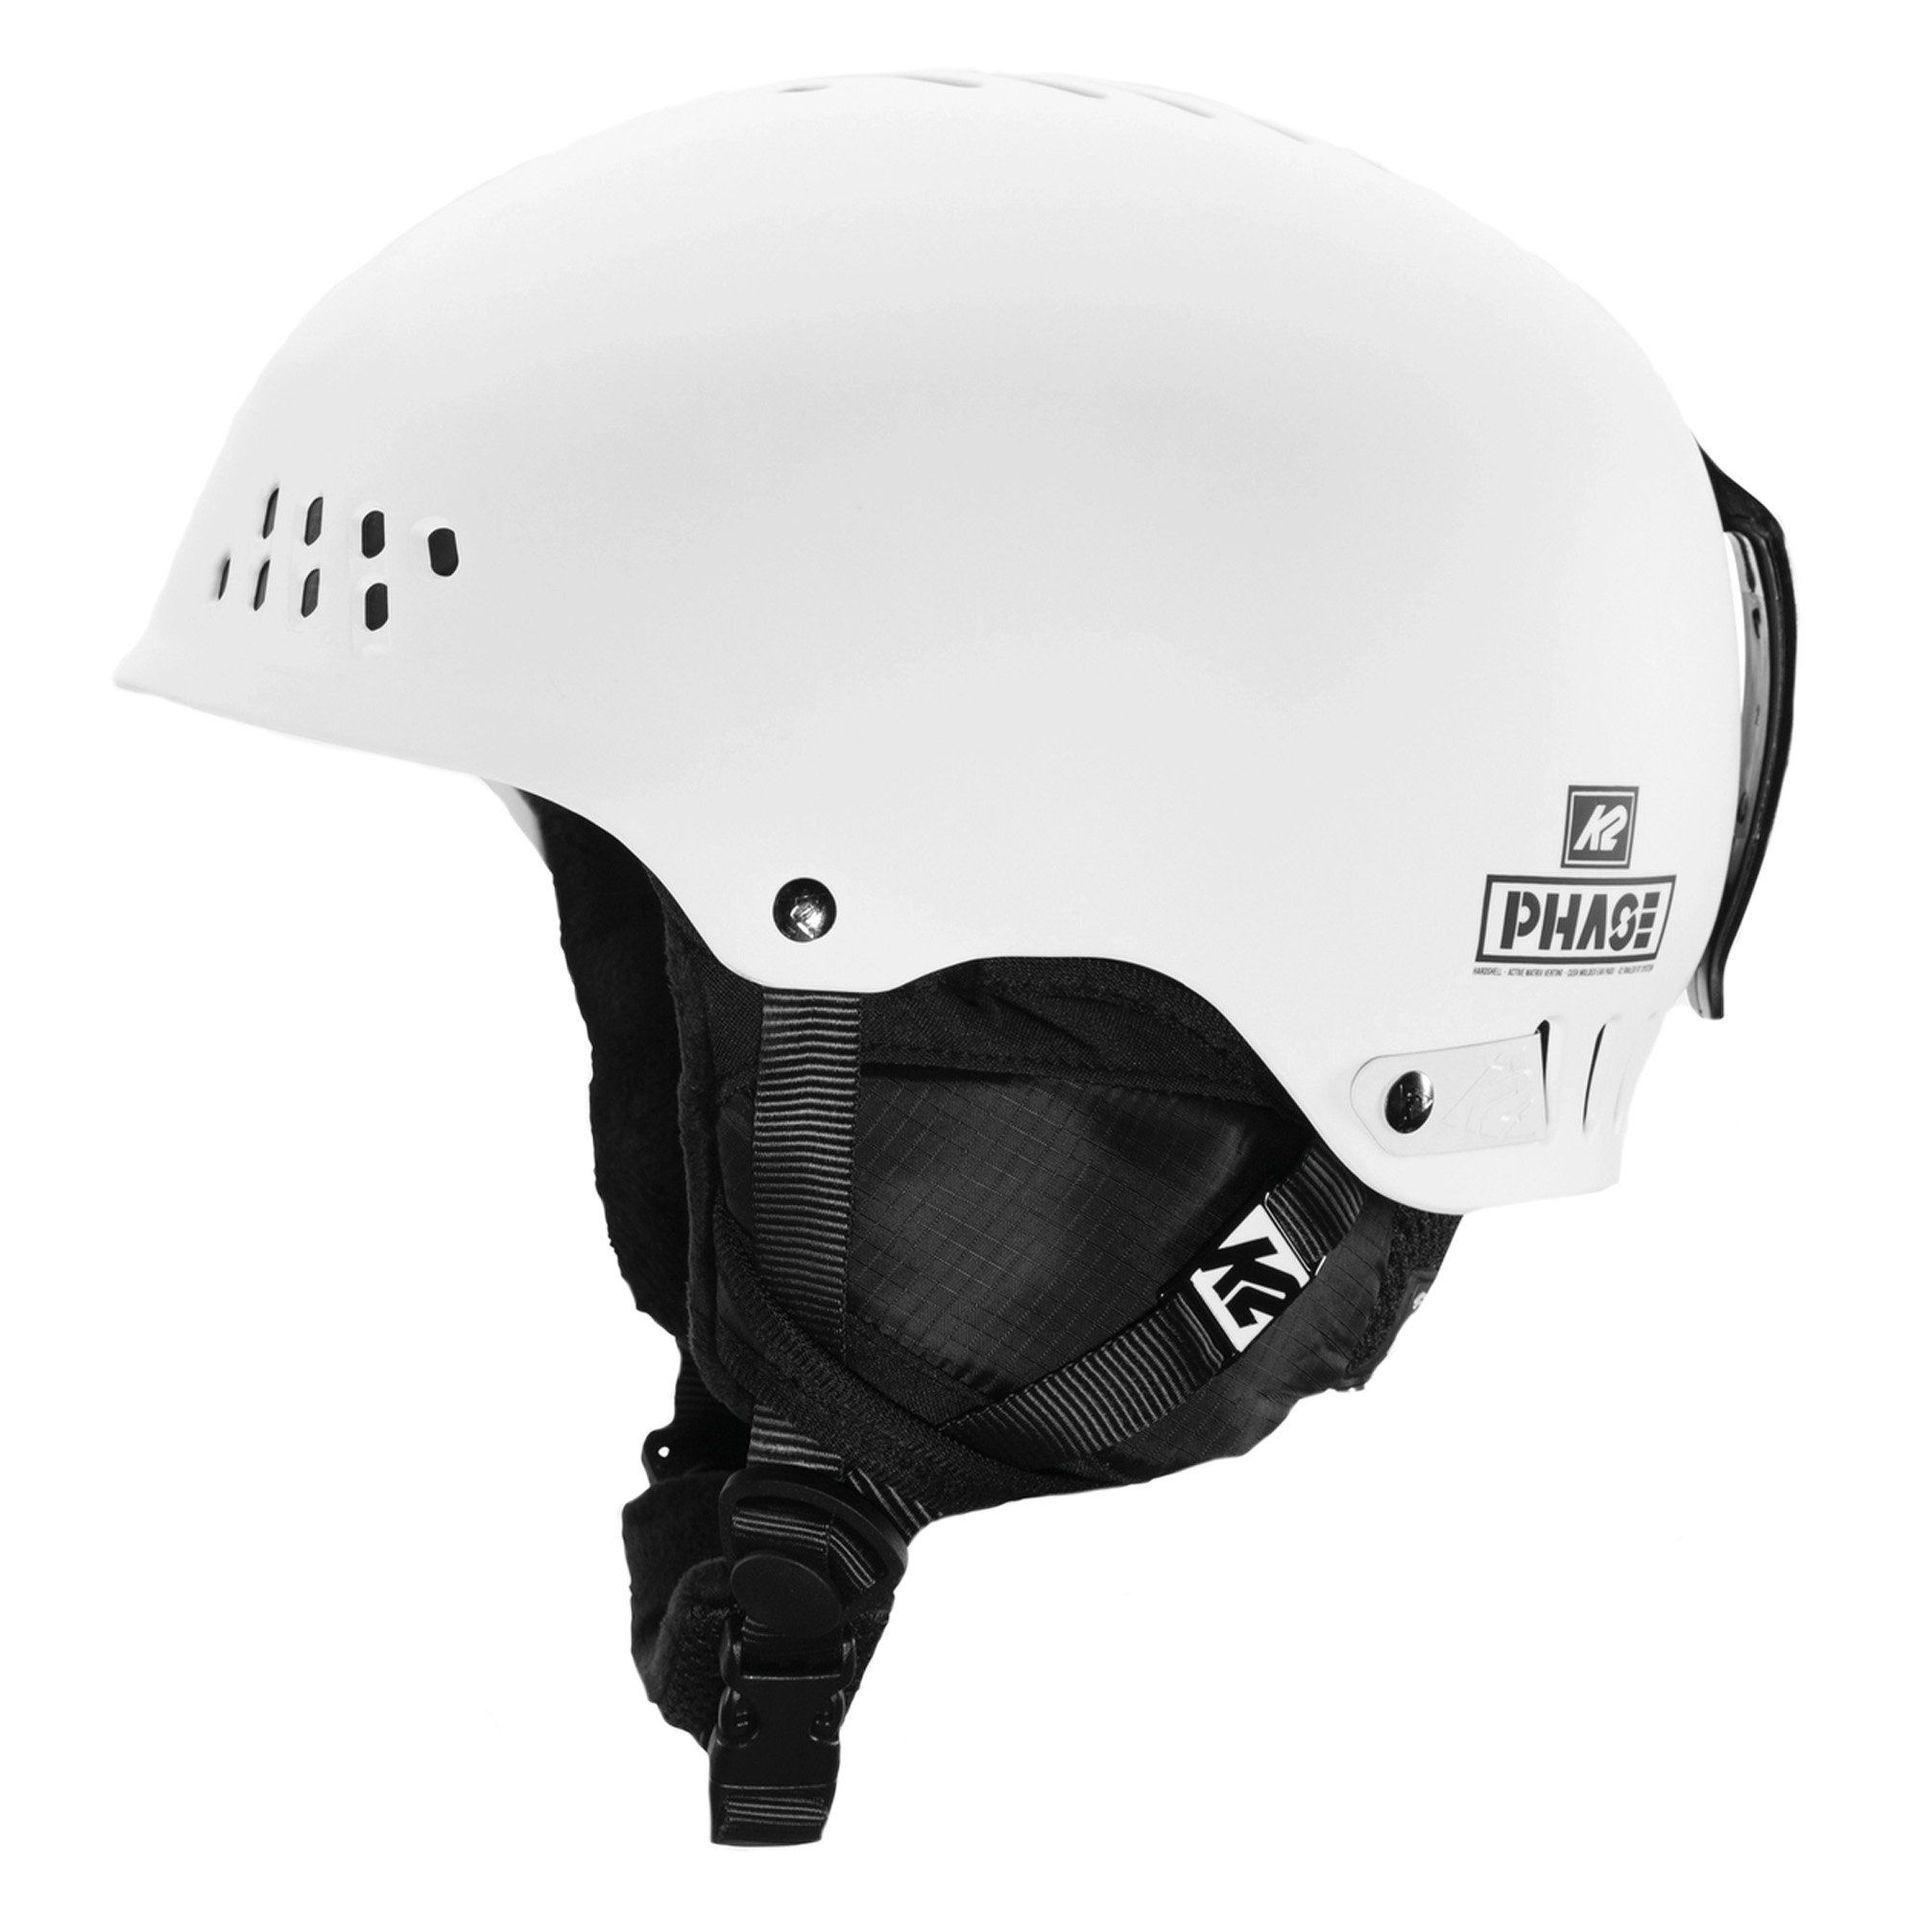 KASK K2 PHASE PRO 10B4000-21 WHITE